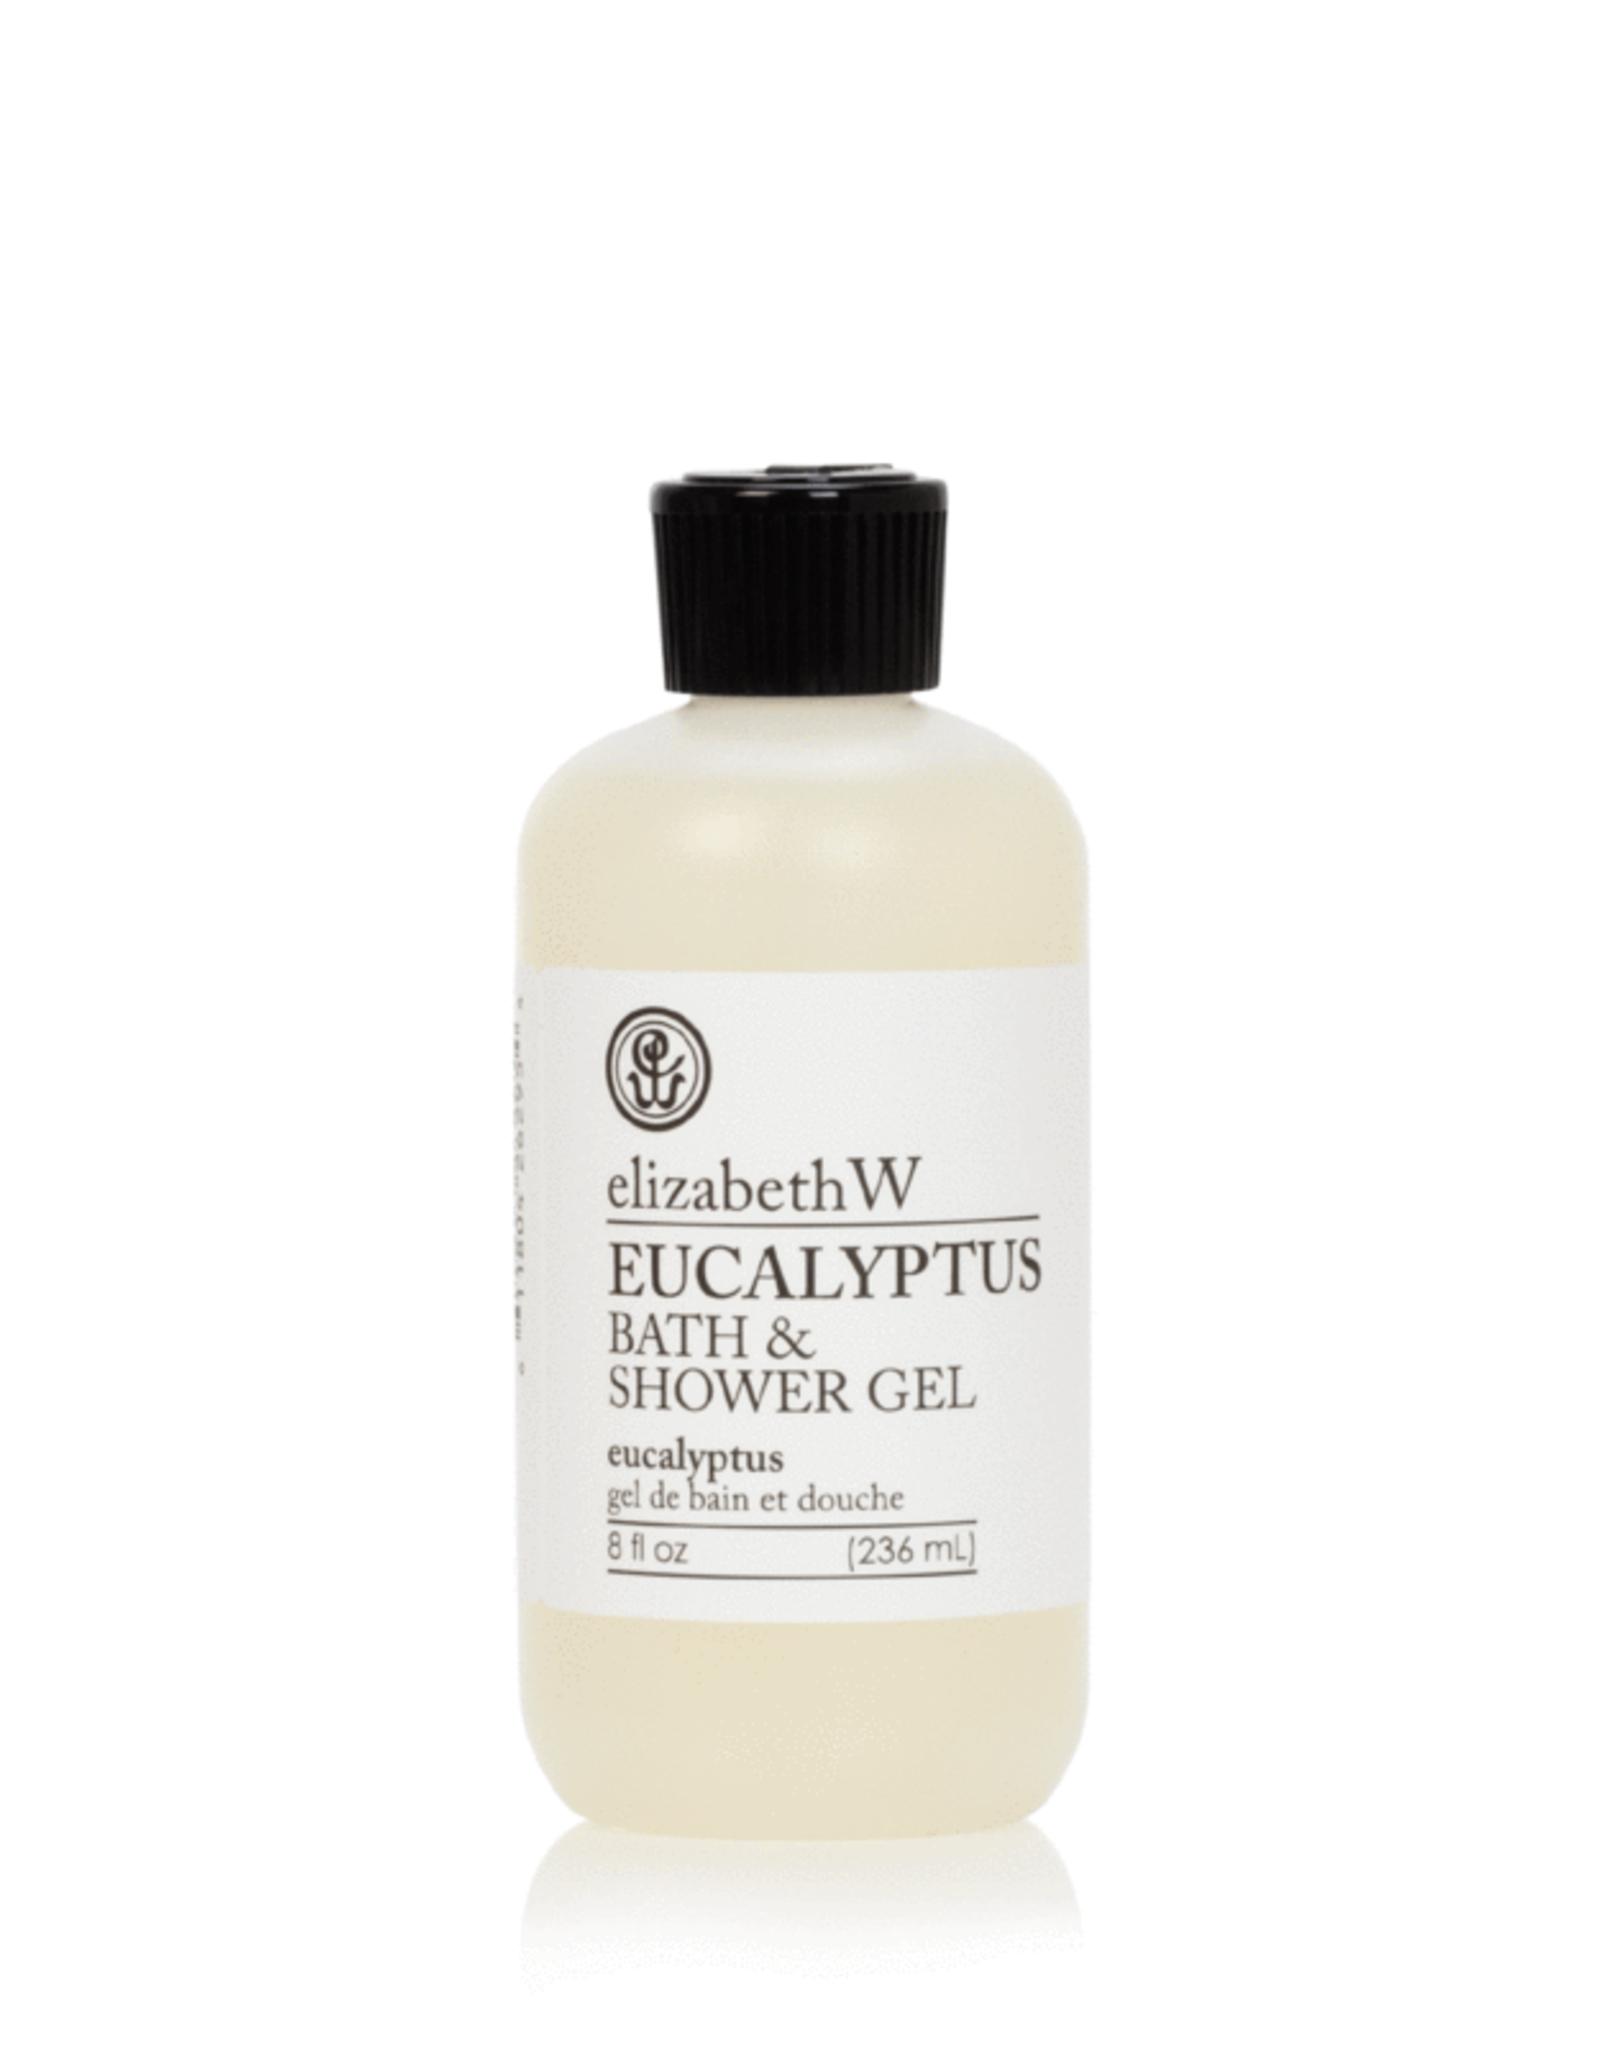 Elizabeth W Eucalyptus Bath & Shower Gel